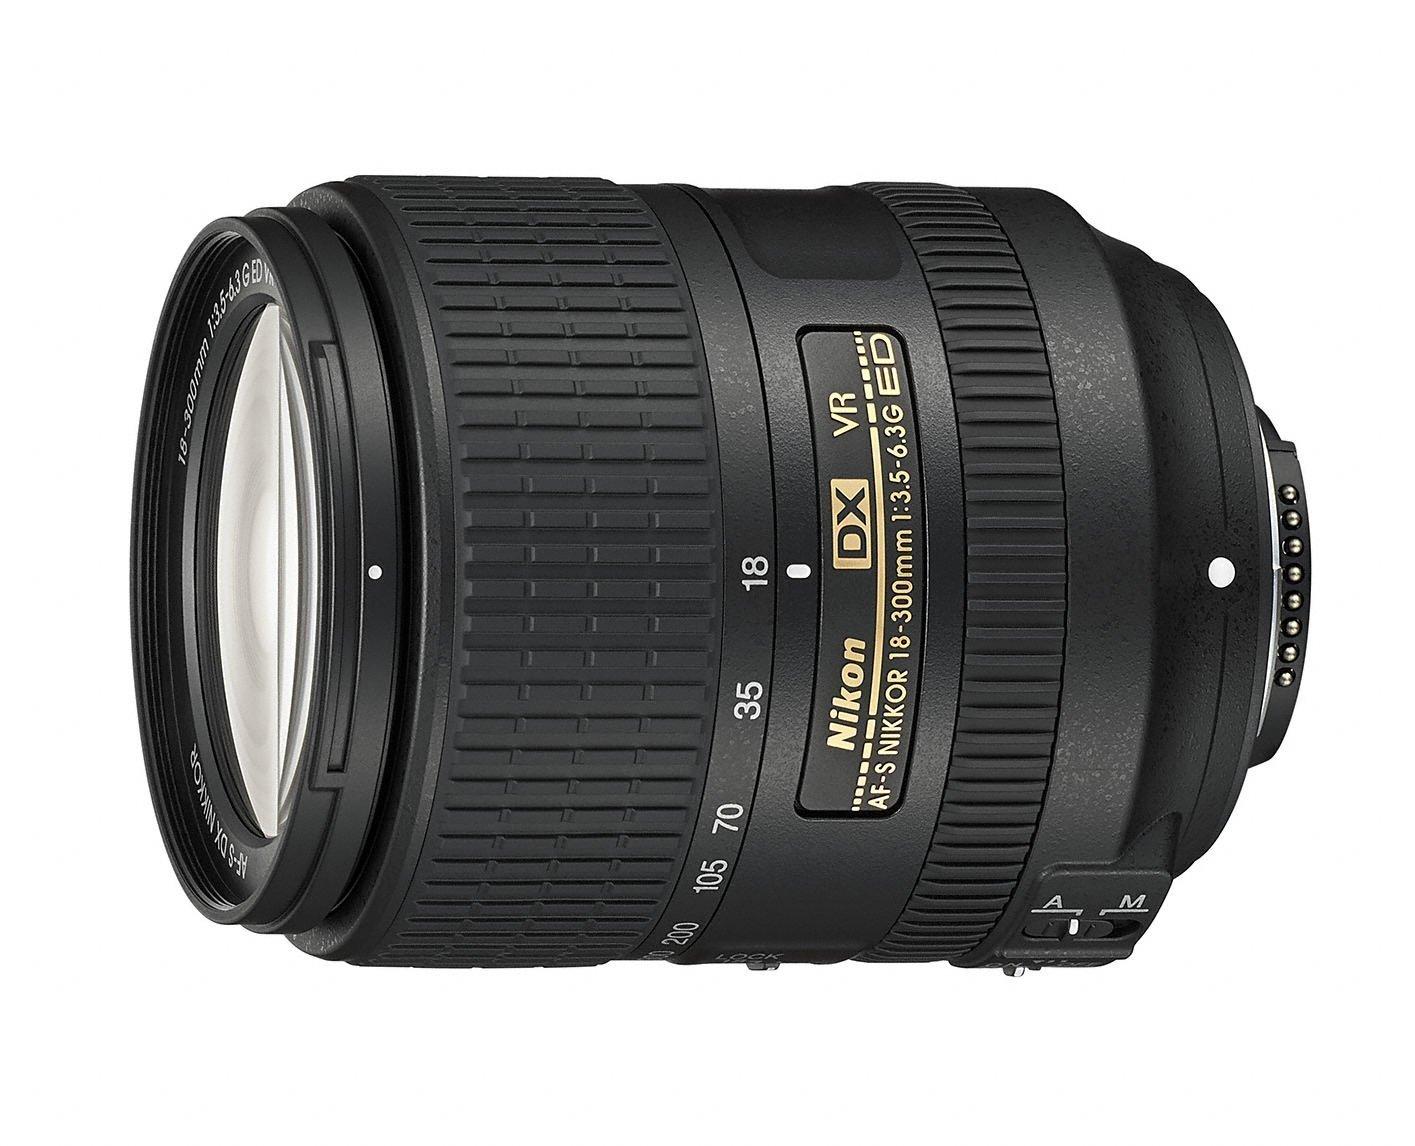 Nikon 18-300mm telephoto lens